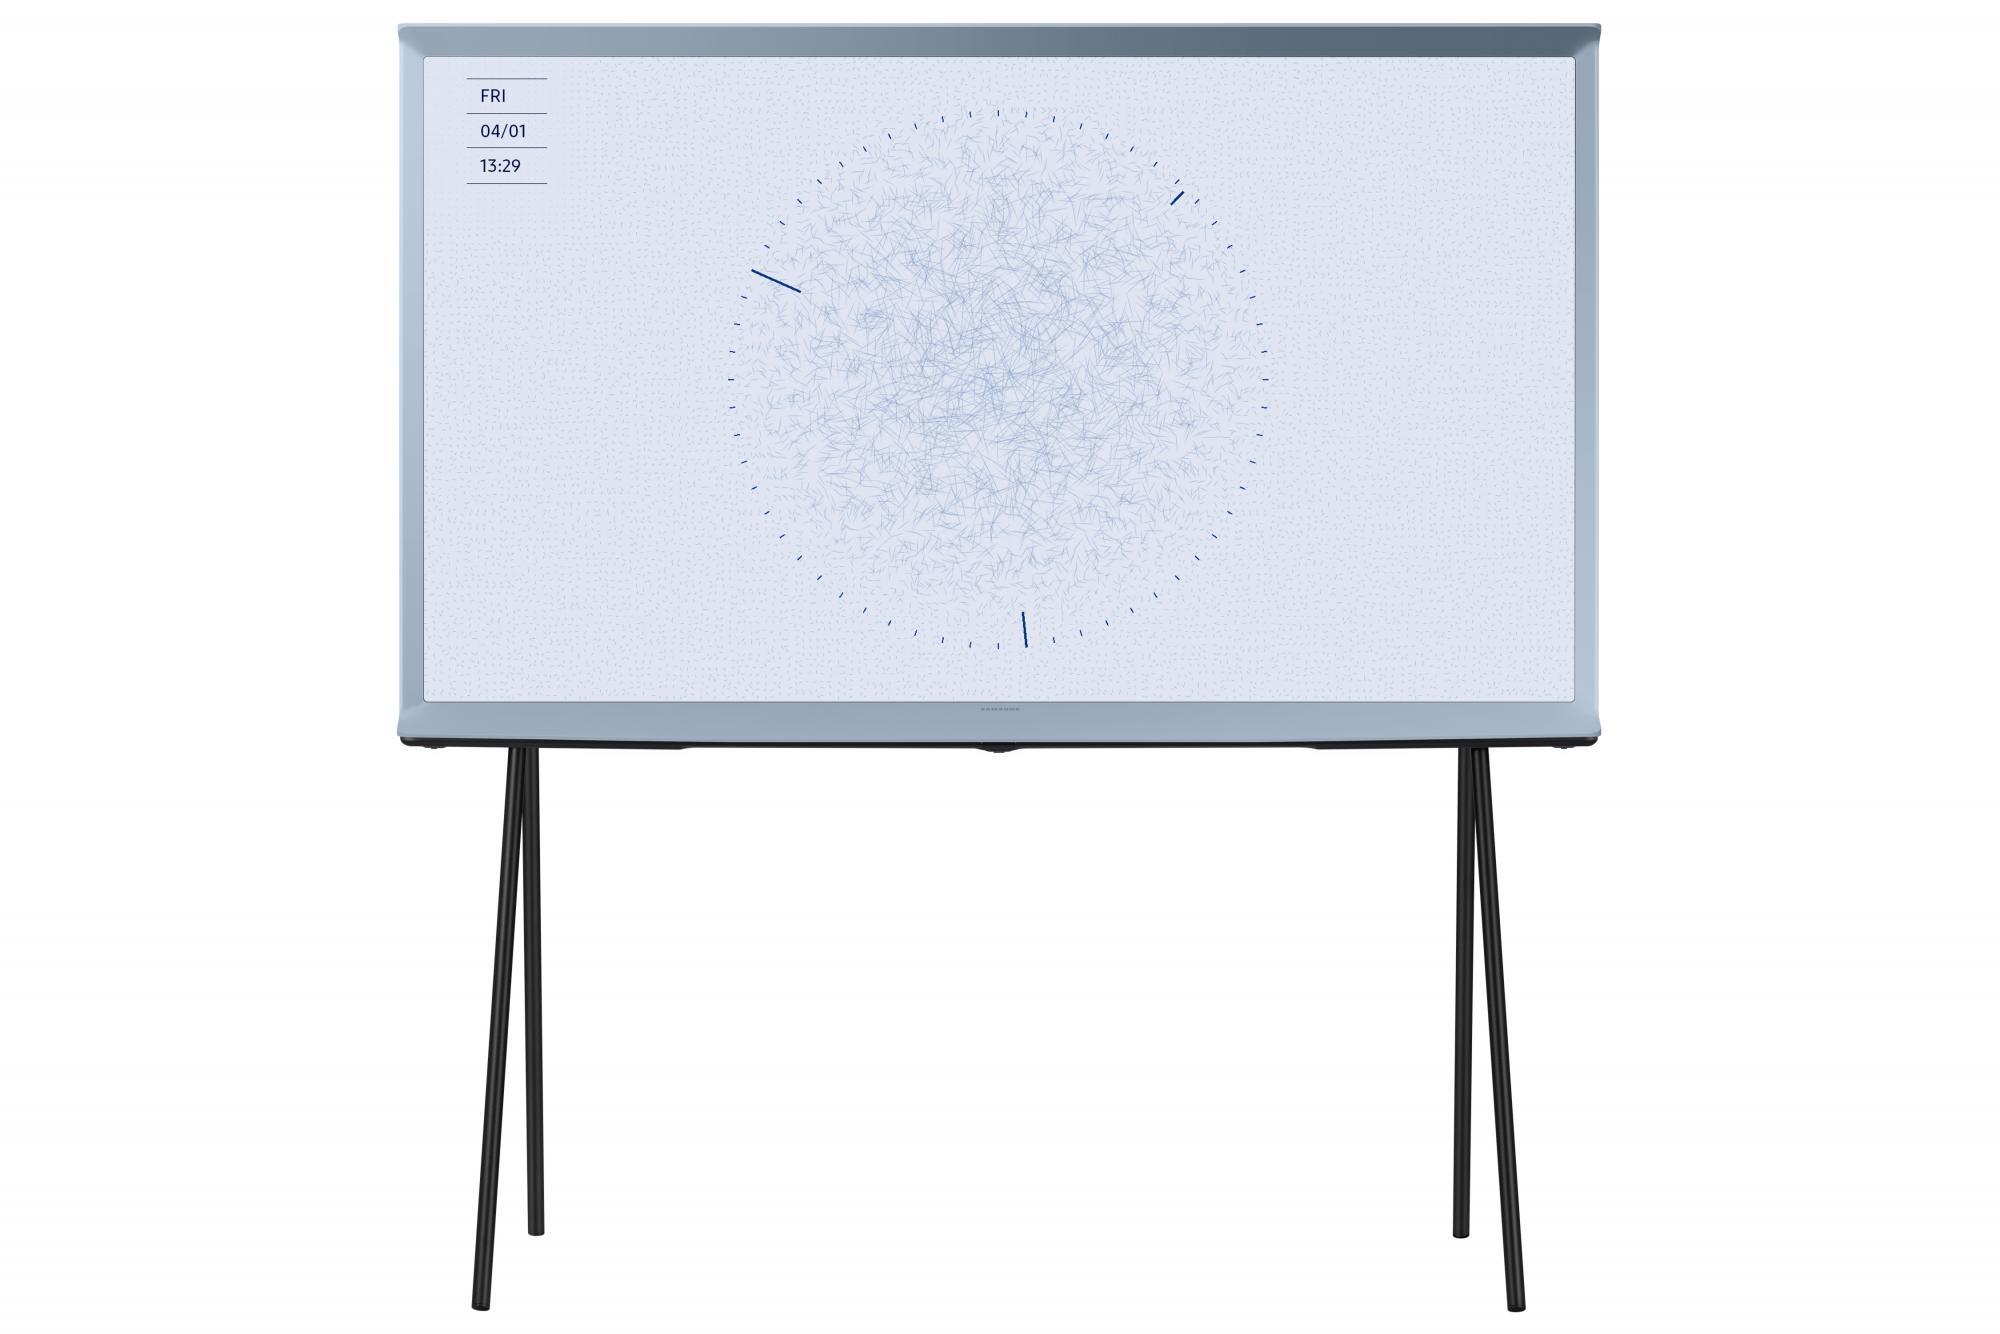 Samsung QE49LS01TB modrý  + 90 dní záruka vrátenia peňazí - QLED 4K TV monitor